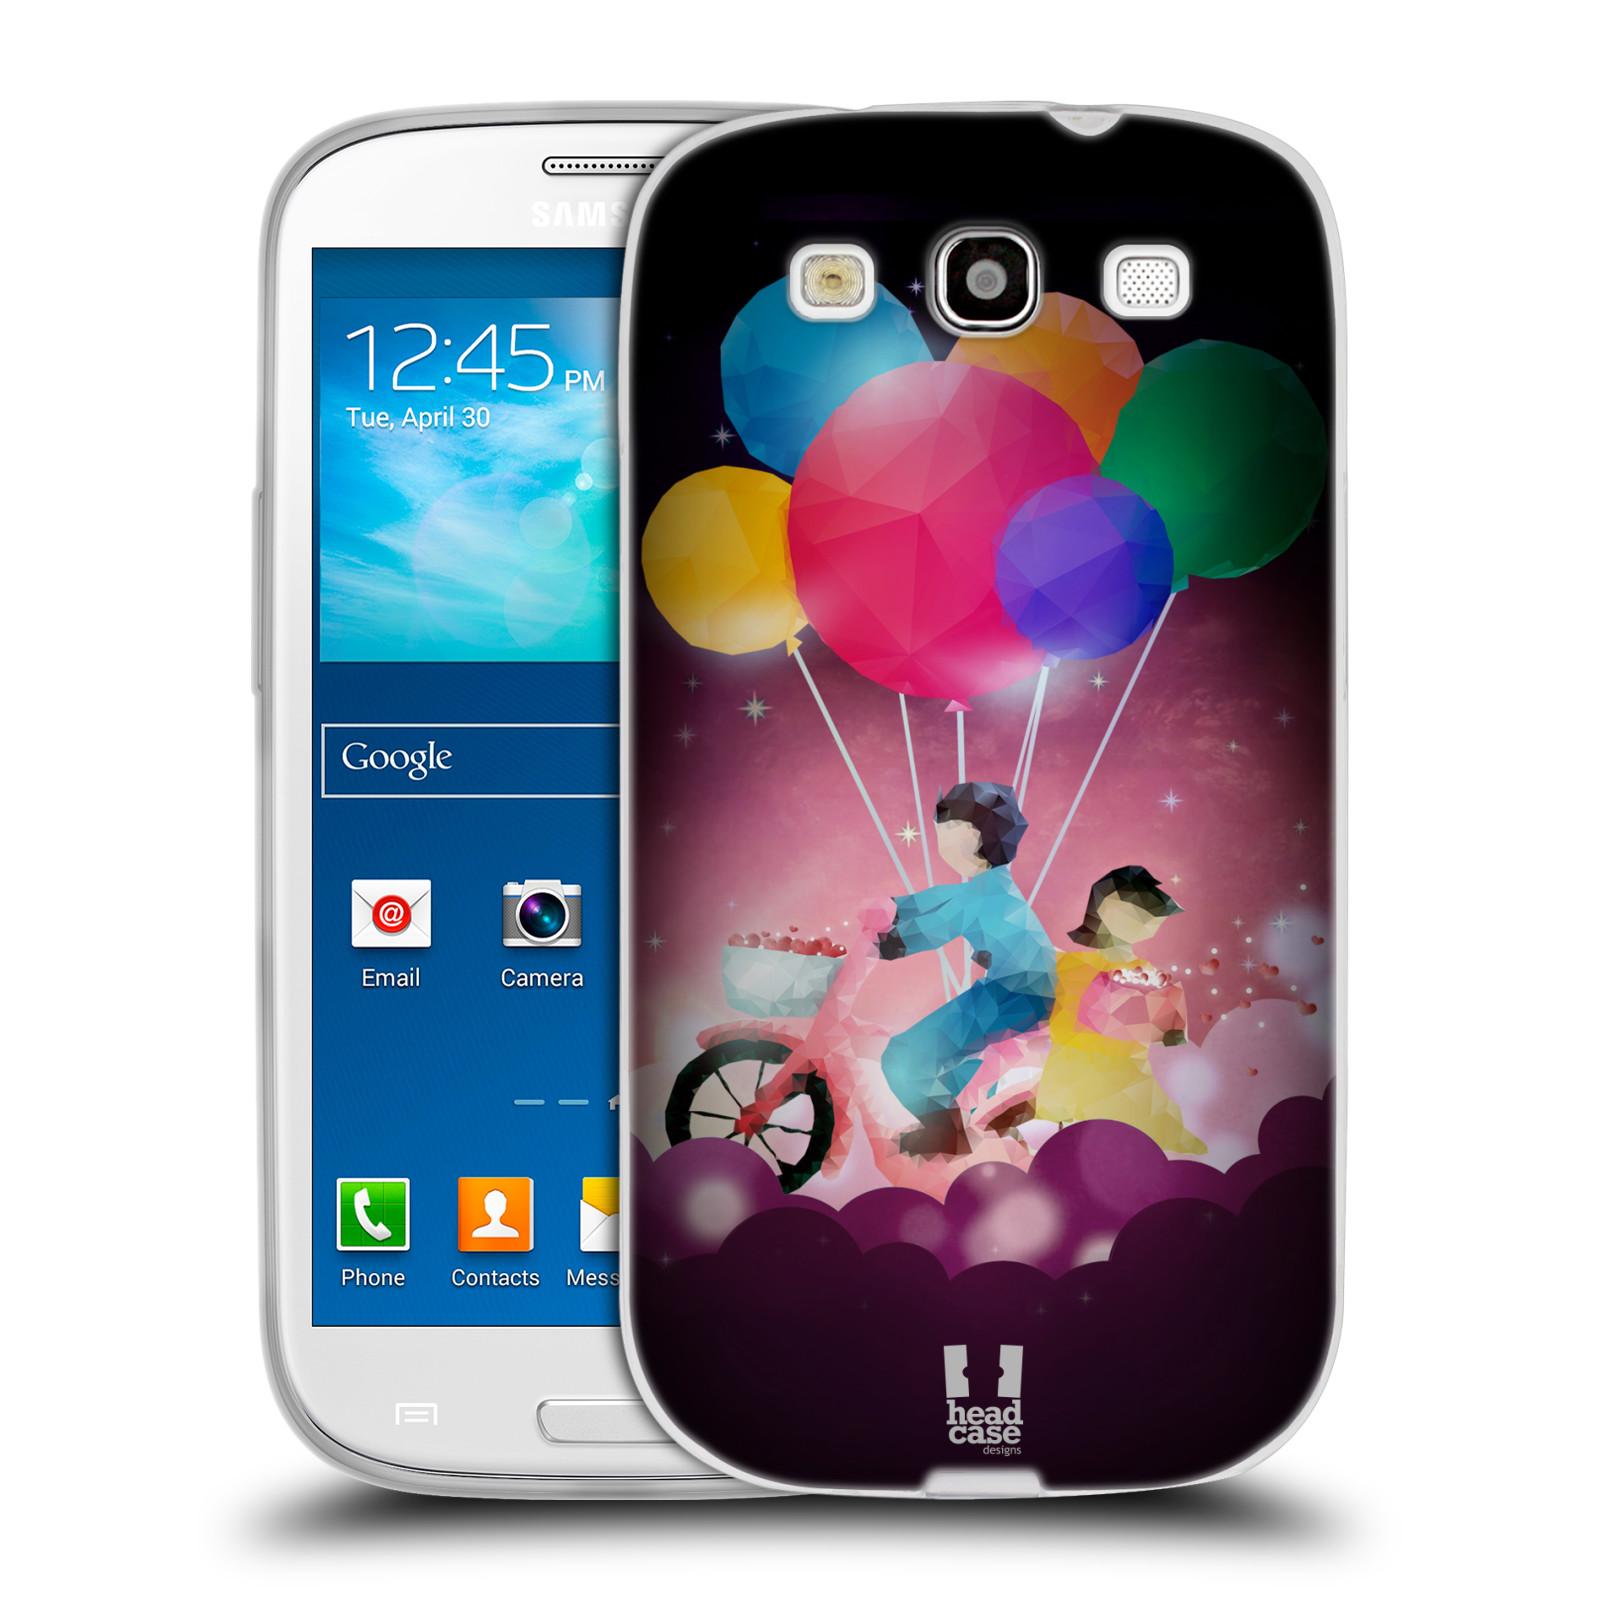 Silikonové pouzdro na mobil Samsung Galaxy S3 Neo HEAD CASE LOVE AFFLOAT COUPLE (Silikonový kryt či obal na mobilní telefon Samsung Galaxy S3 Neo GT-i9301i)